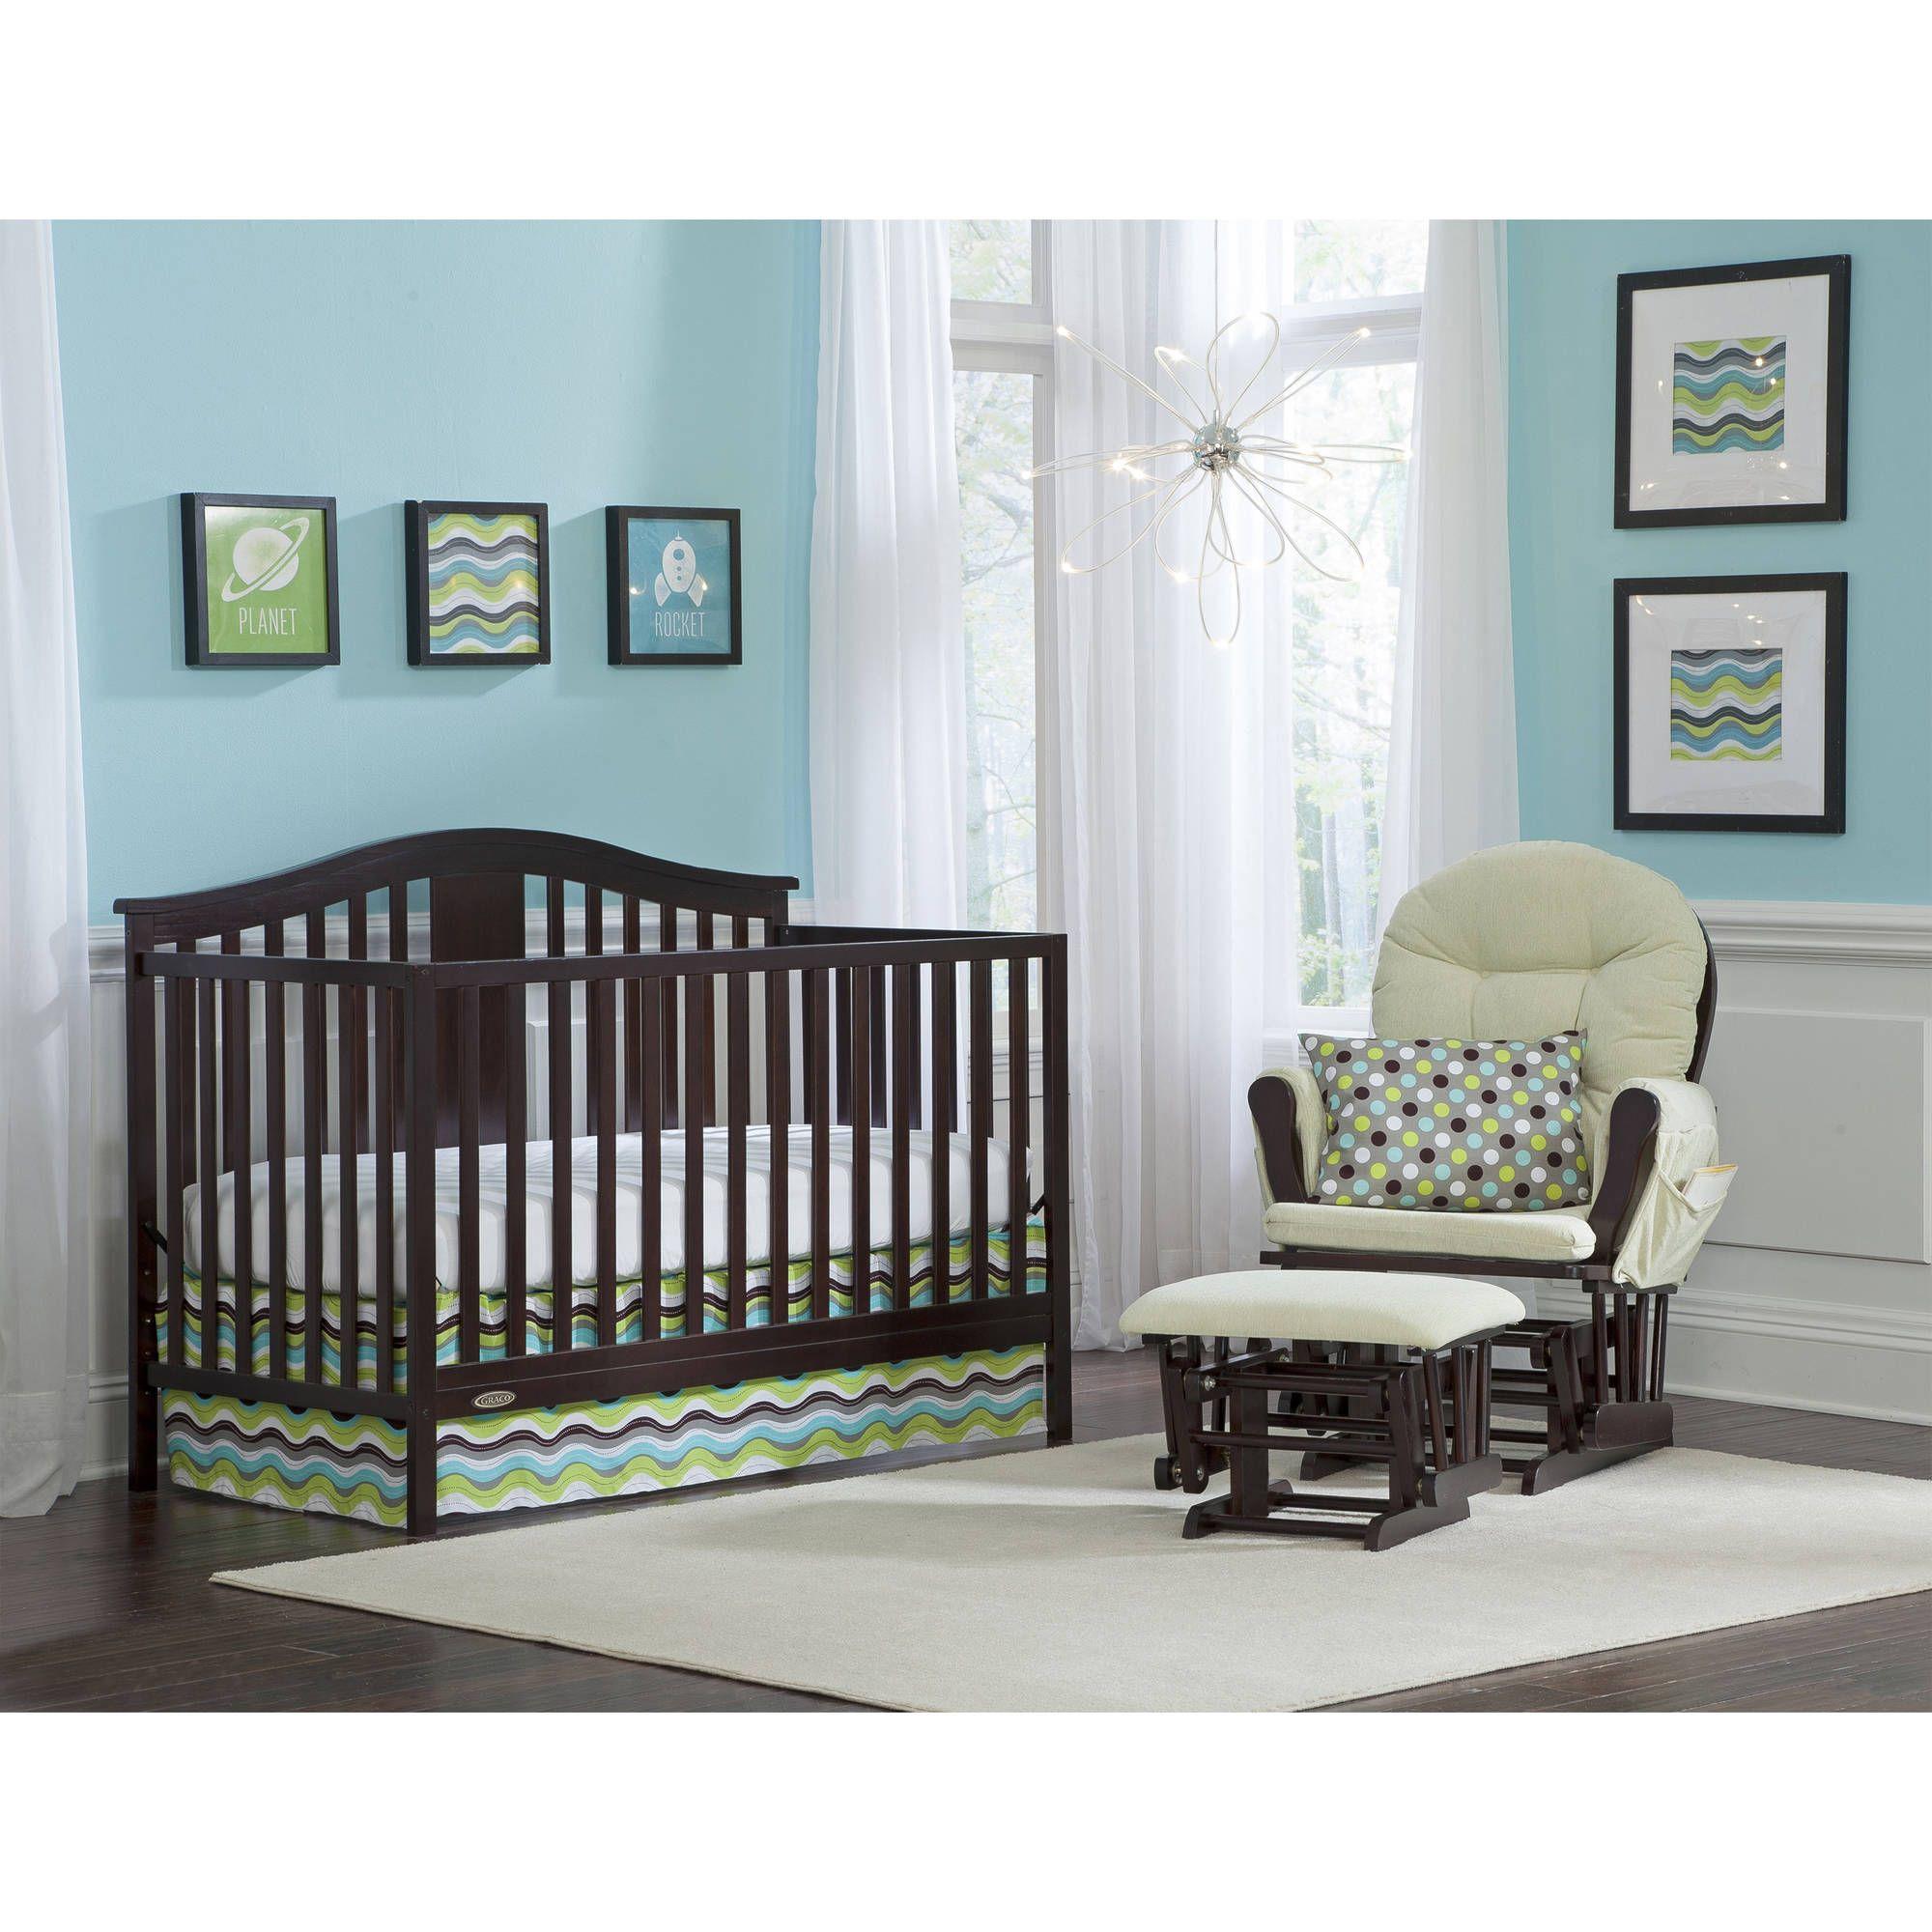 walmart convertible en ip in crib baby aaden canada cribs relax